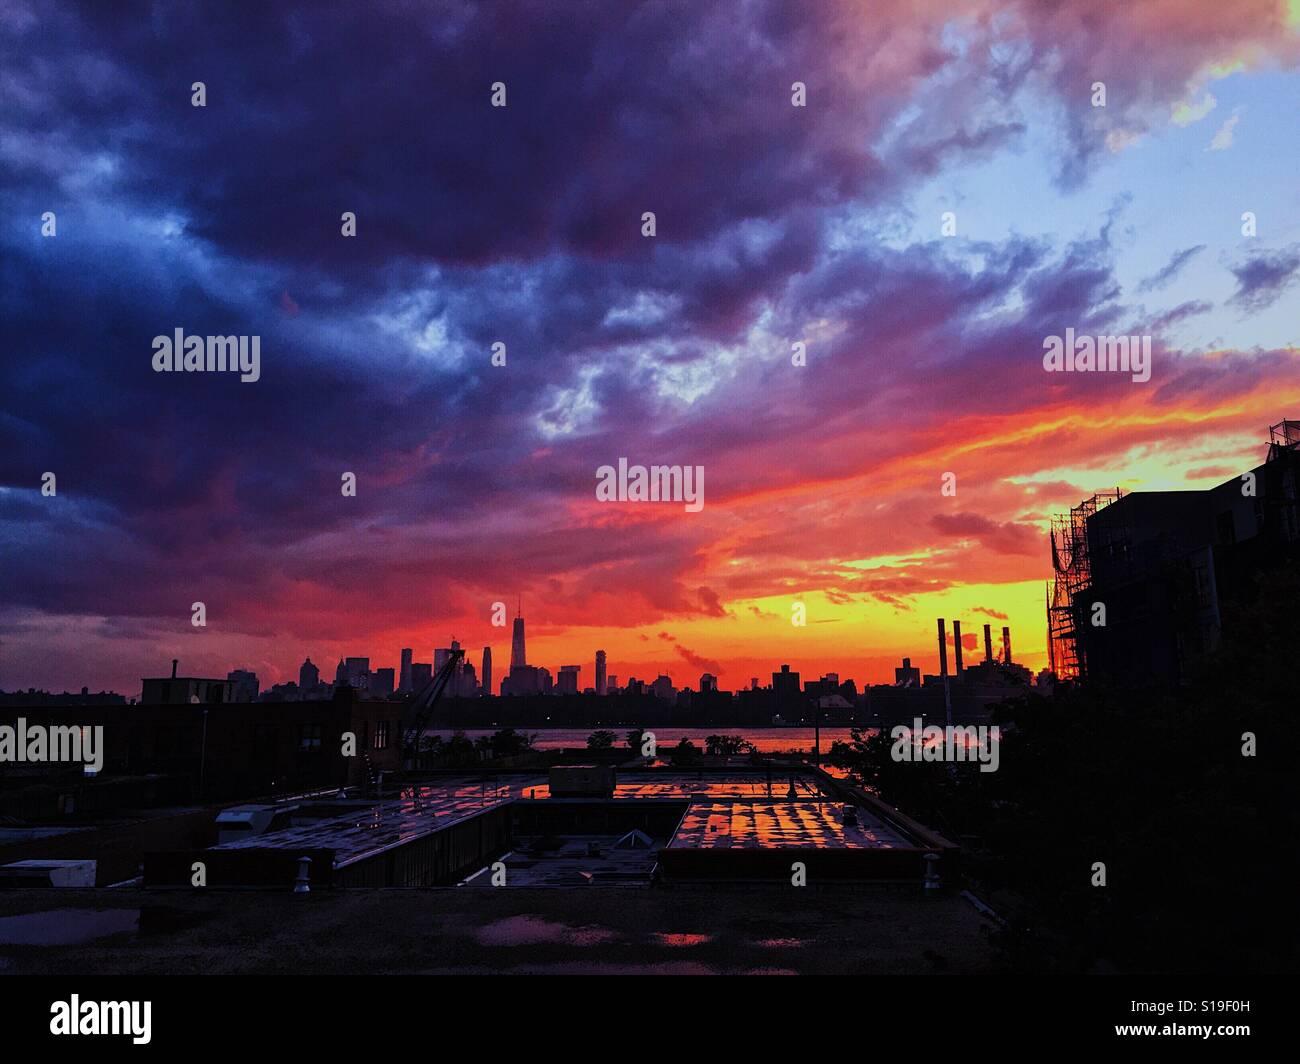 Gran ciudad antes de la tormenta Foto de stock